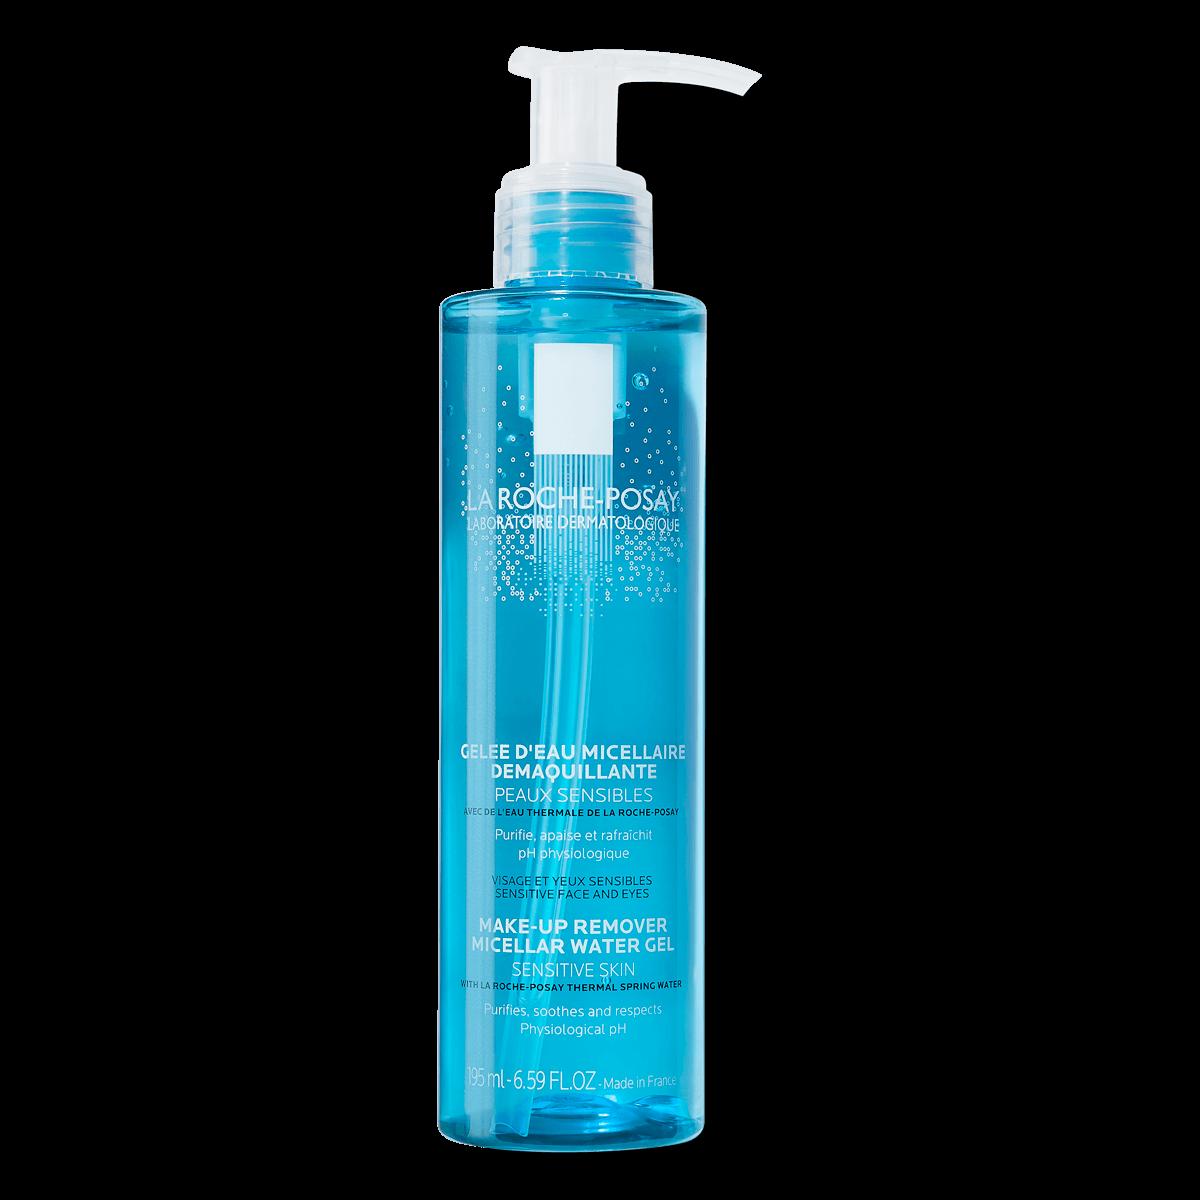 La Roche Posay Produktsida Sminkborttagning Micellar Water Gel 195ml